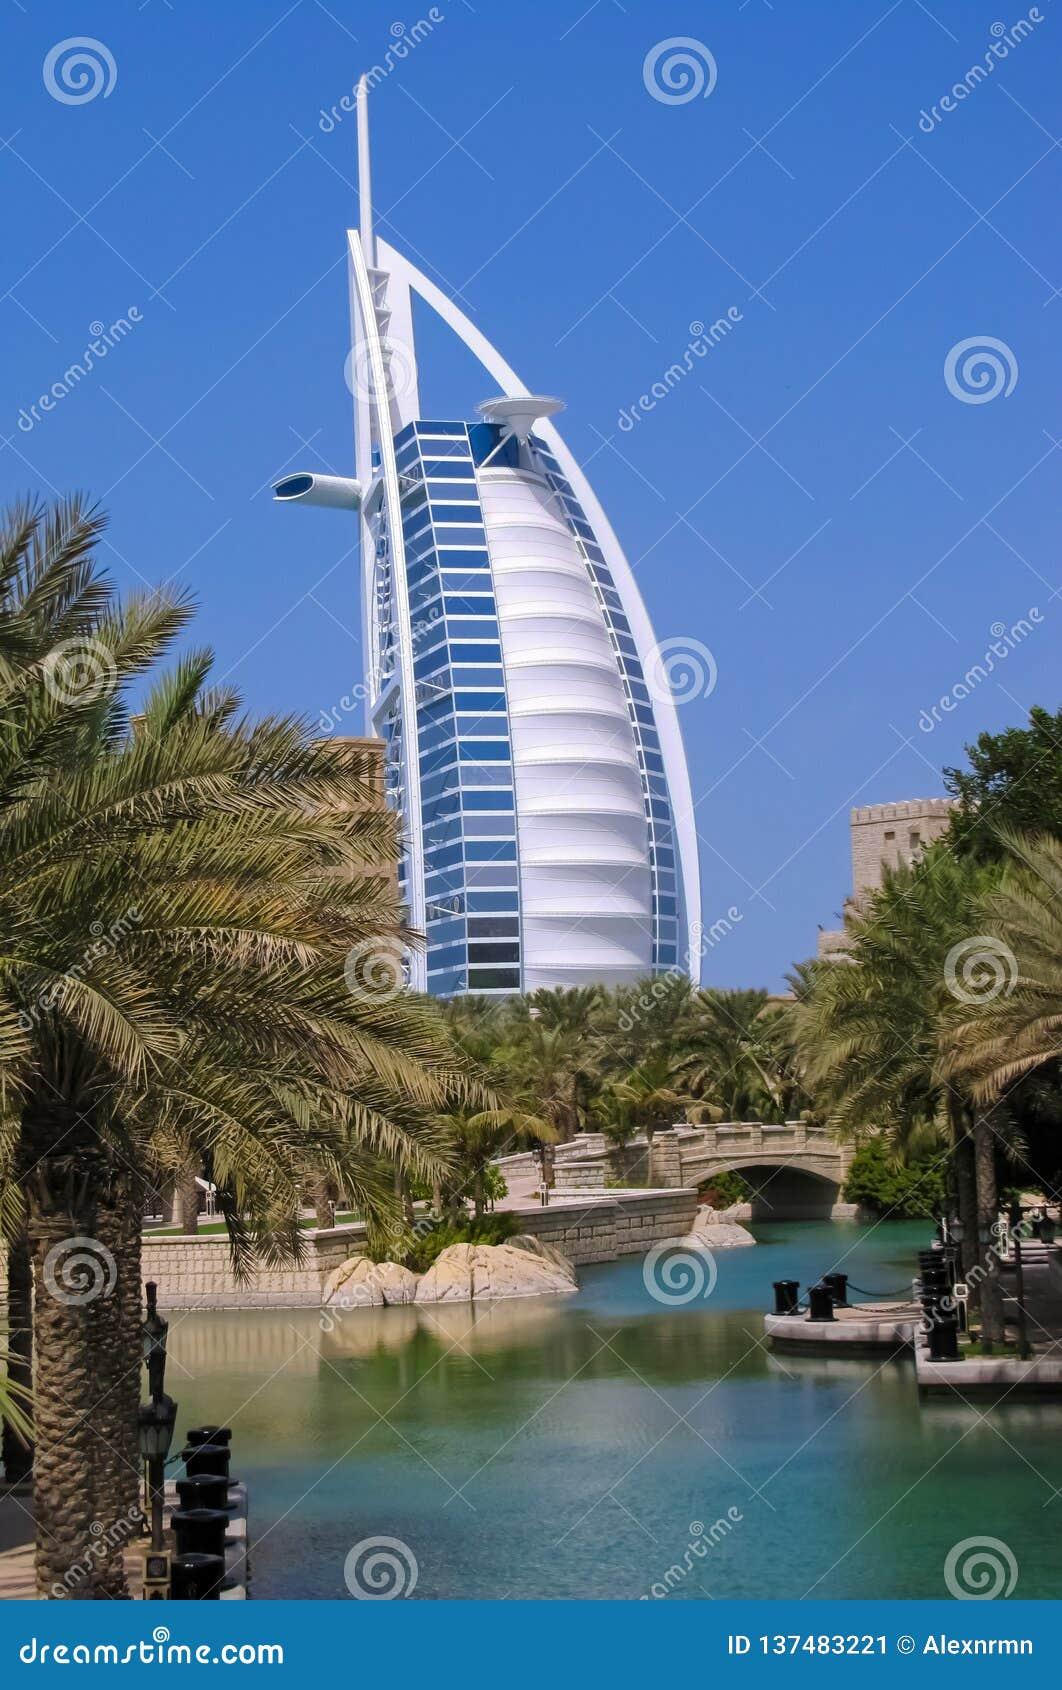 Al Άραβας Burj ξενοδοχείων στο υπόβαθρο των καναλιών νερού Jumeirah